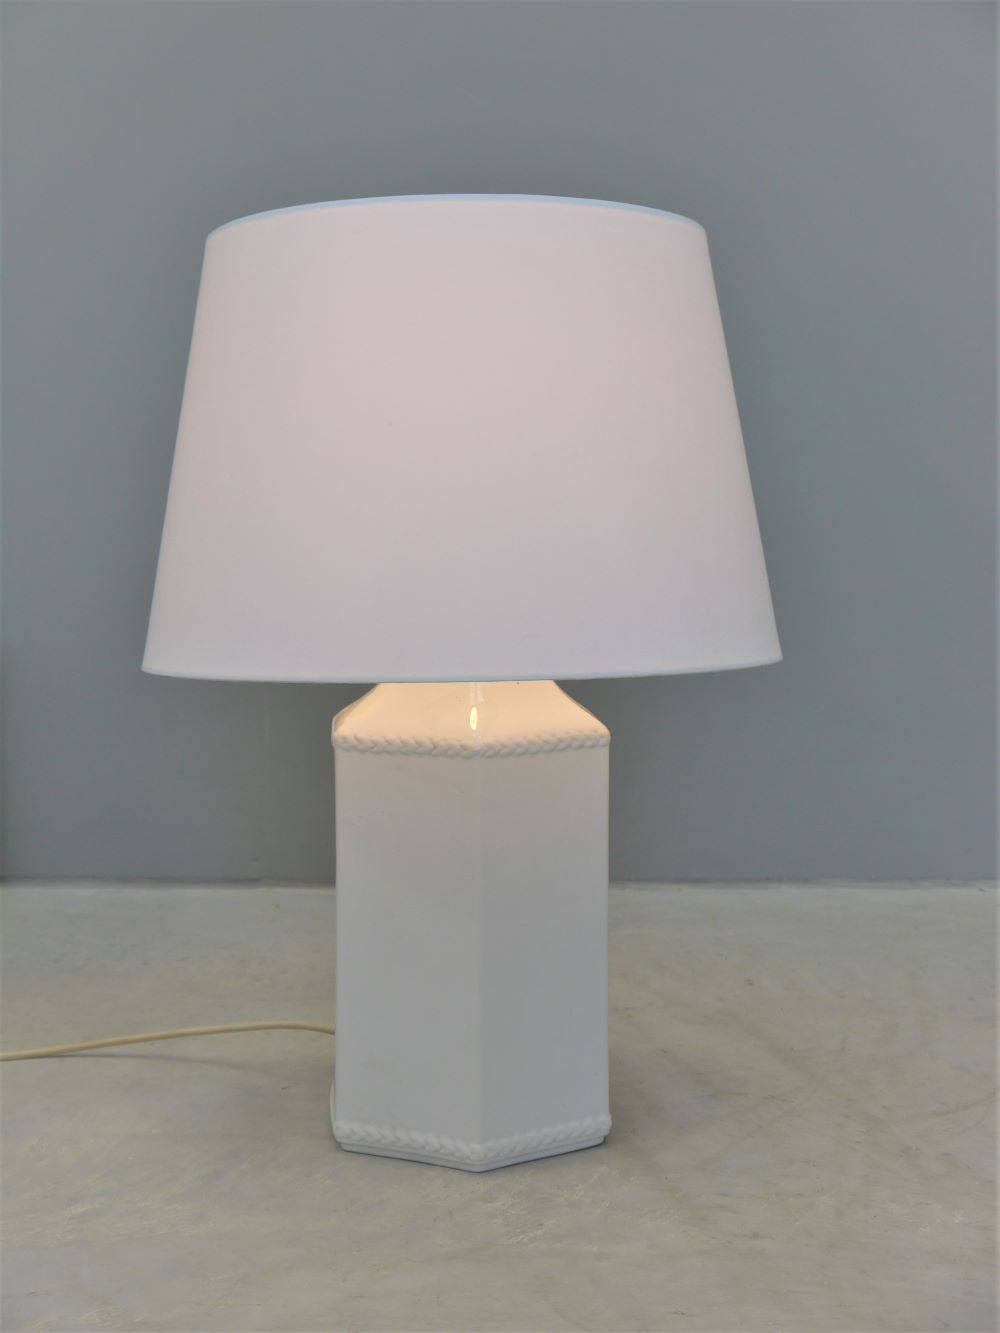 Spanish – Large Scale Ceramic Table Lamp